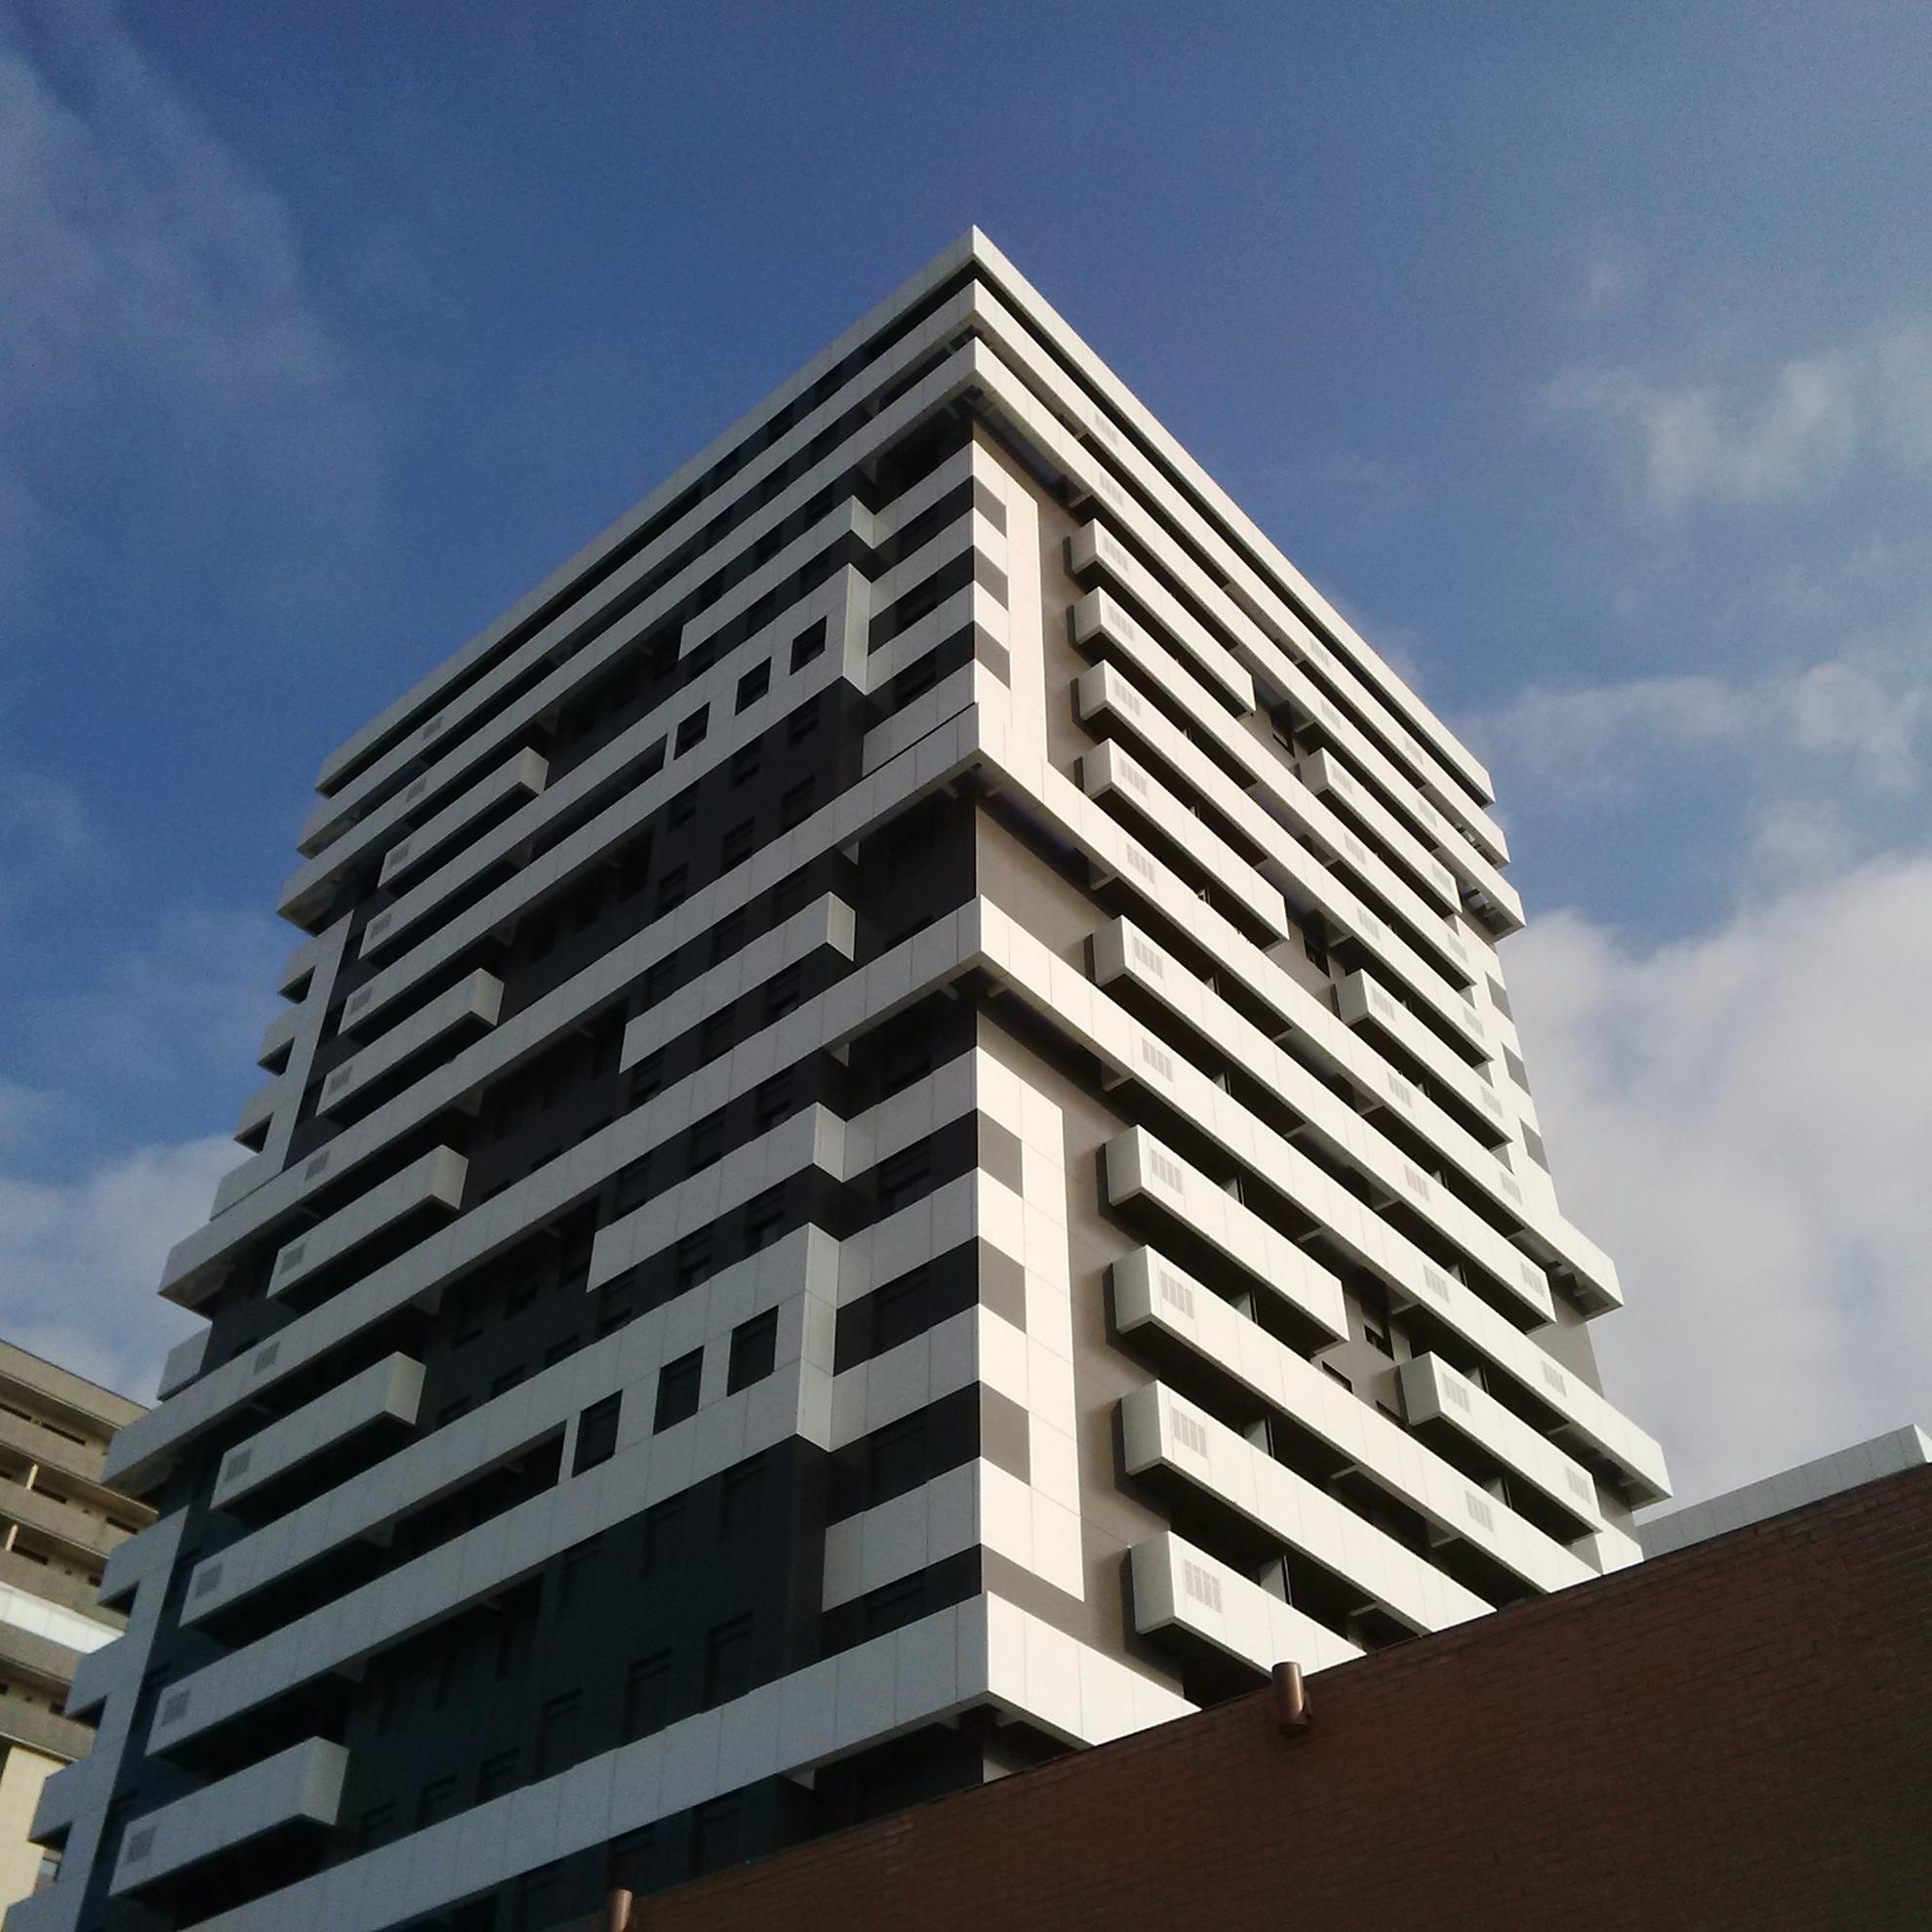 Torres-Catalua.-Tarragona-Espaa.-larson-blanco-puro.-Sistema-Remachado-1_1585902551.jpg